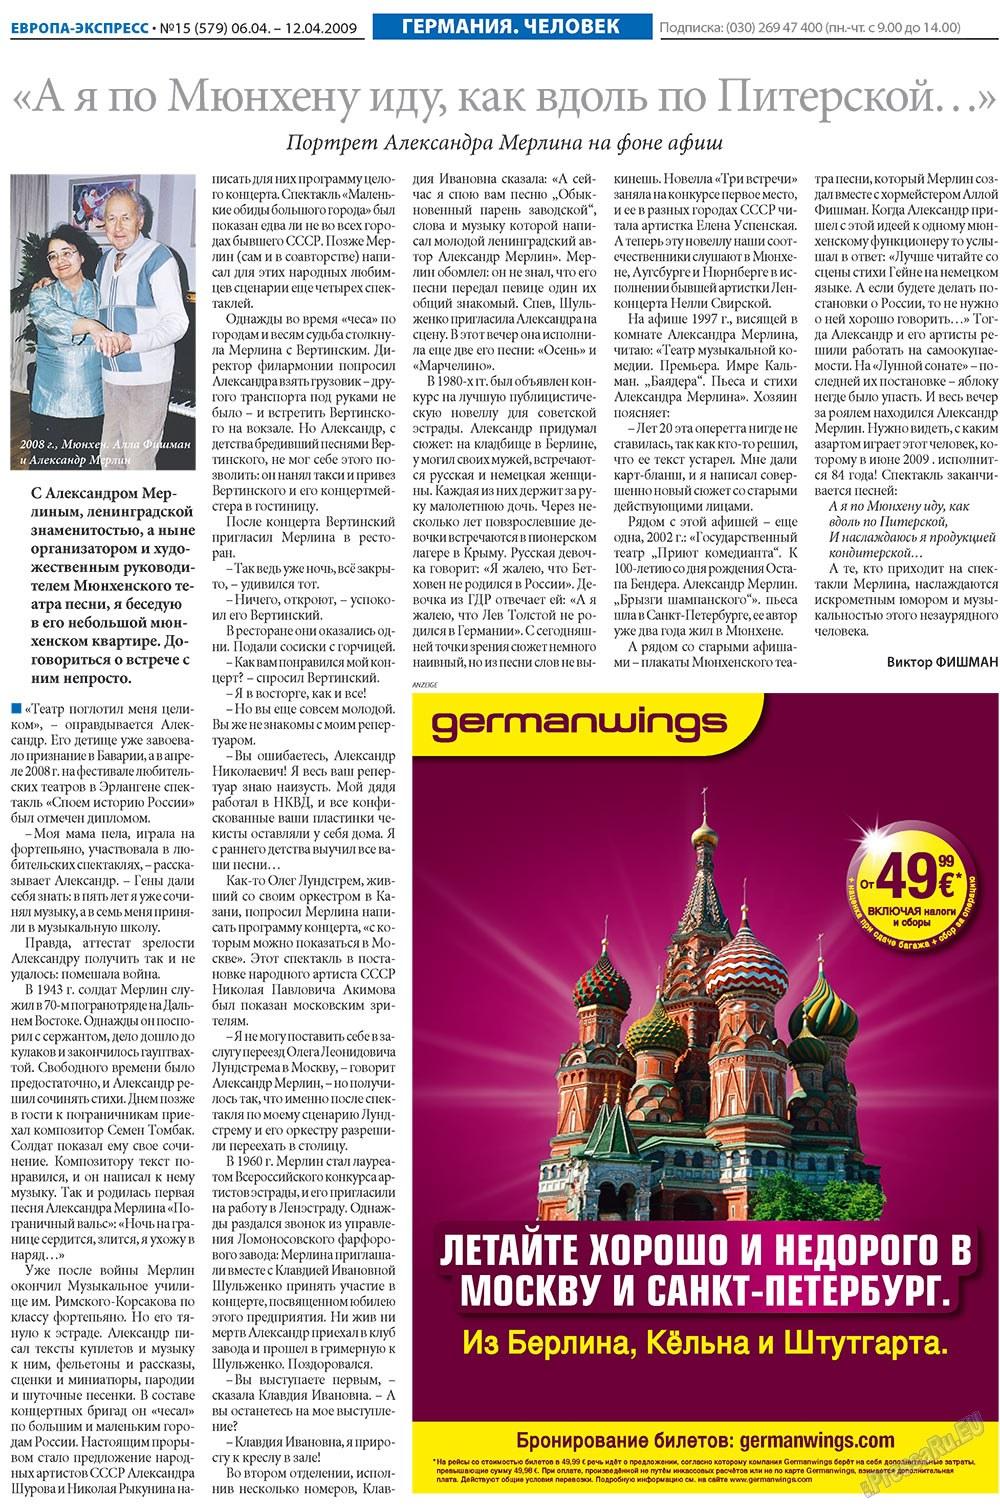 Европа экспресс (газета). 2009 год, номер 15, стр. 5